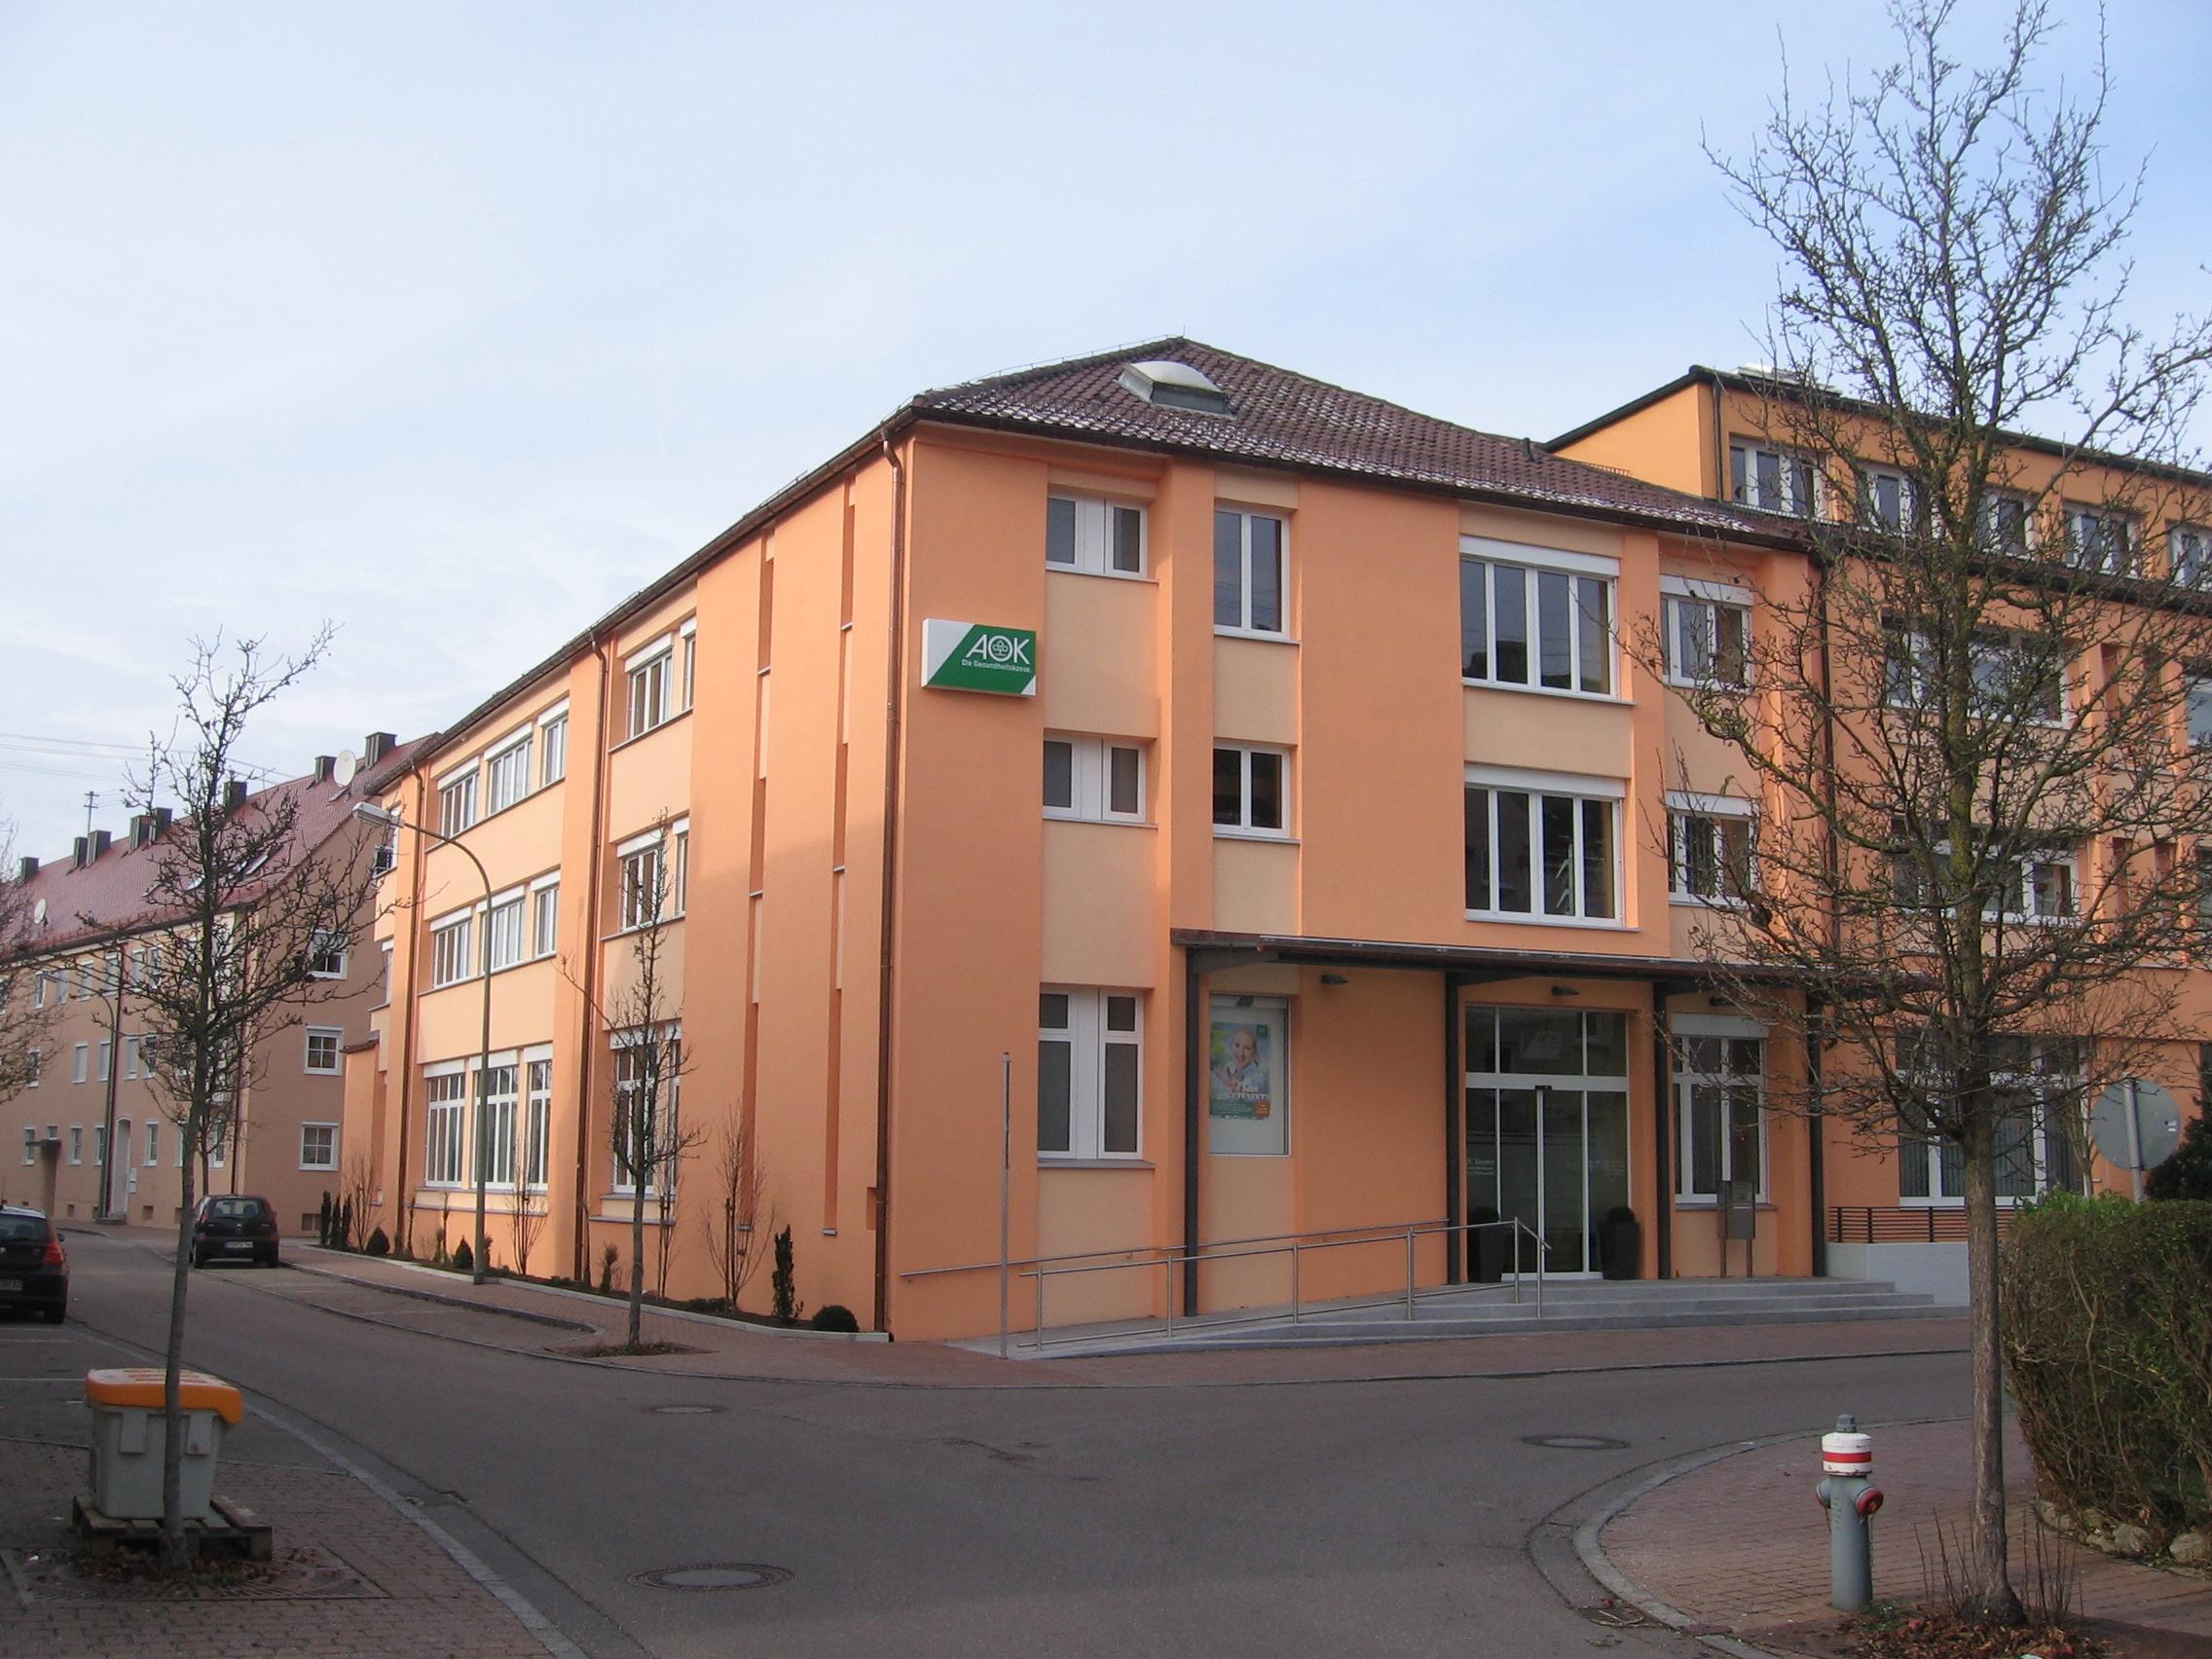 2-Fassadensanierung-AOK-Donauwörth-Ansicht StraßeIMG_0660